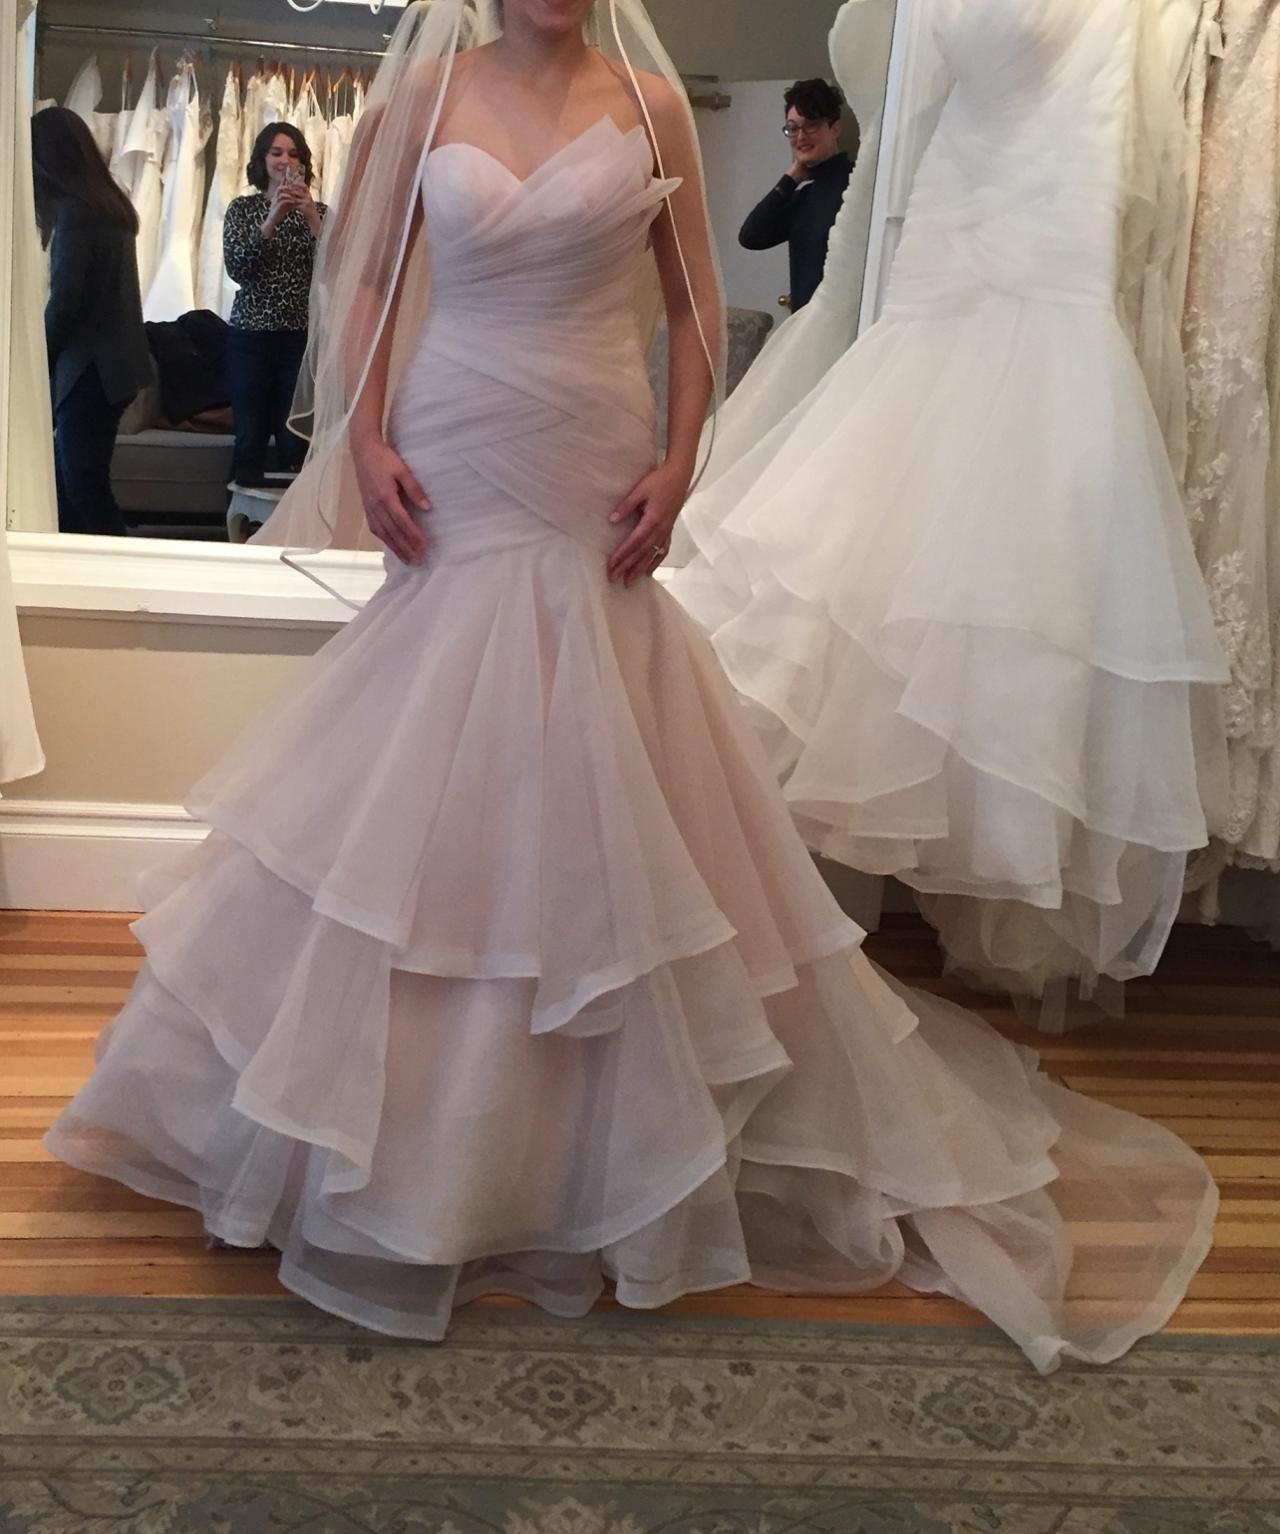 Mermaid ruffle wedding dress  Charming Wedding DressTulle Wedding DressesSexy Wedding Gown